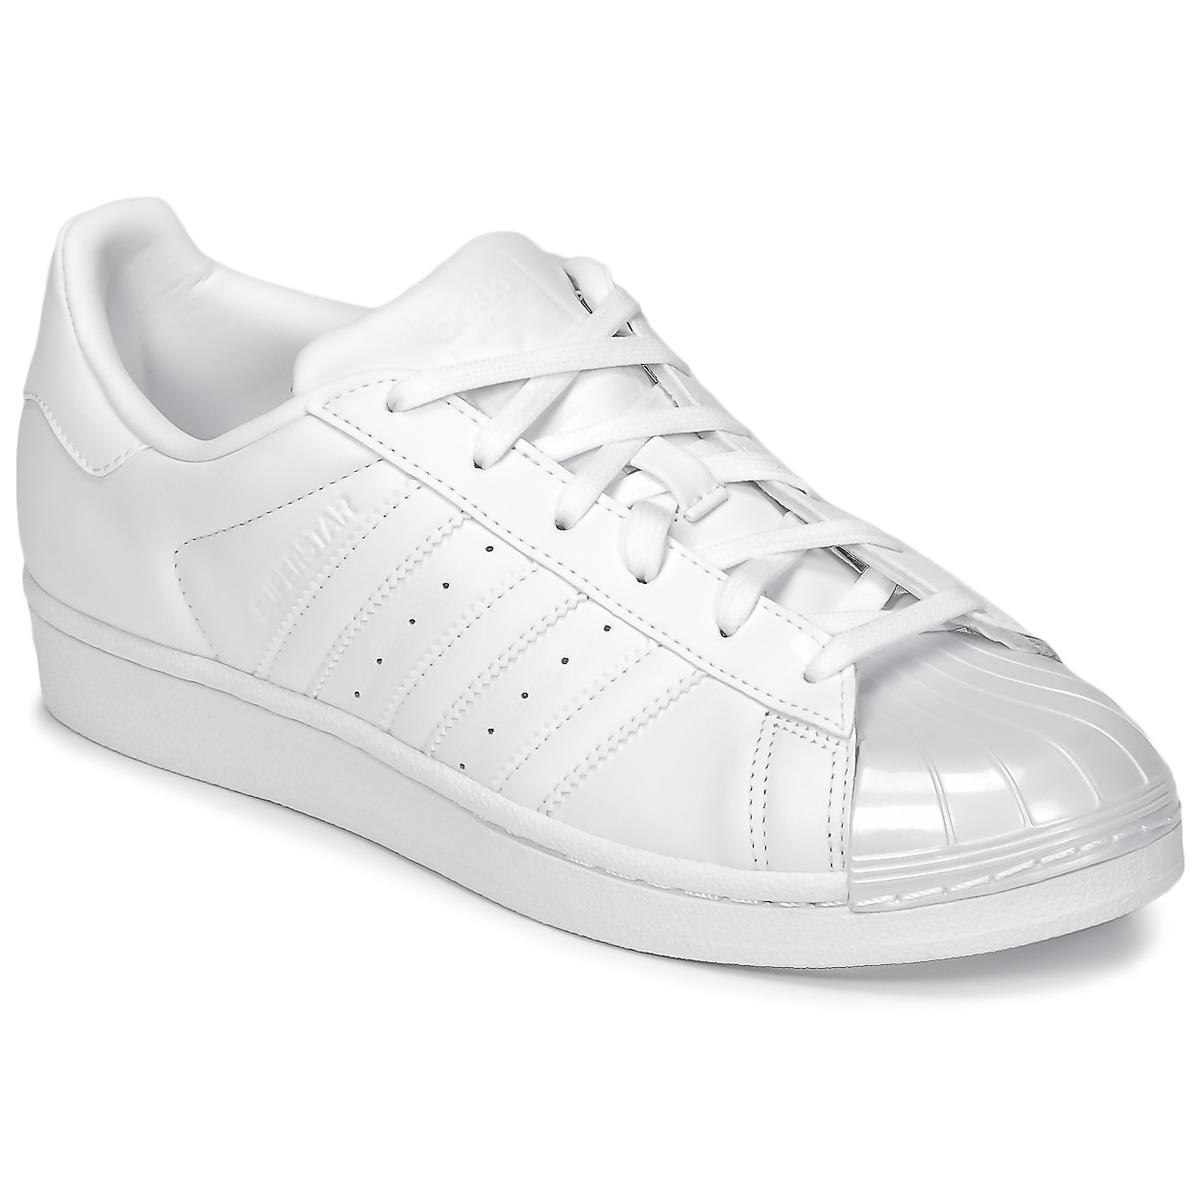 Sneaker Homme Pas cher en Soldes, Blanc, Cuir, 2017, 40adidas